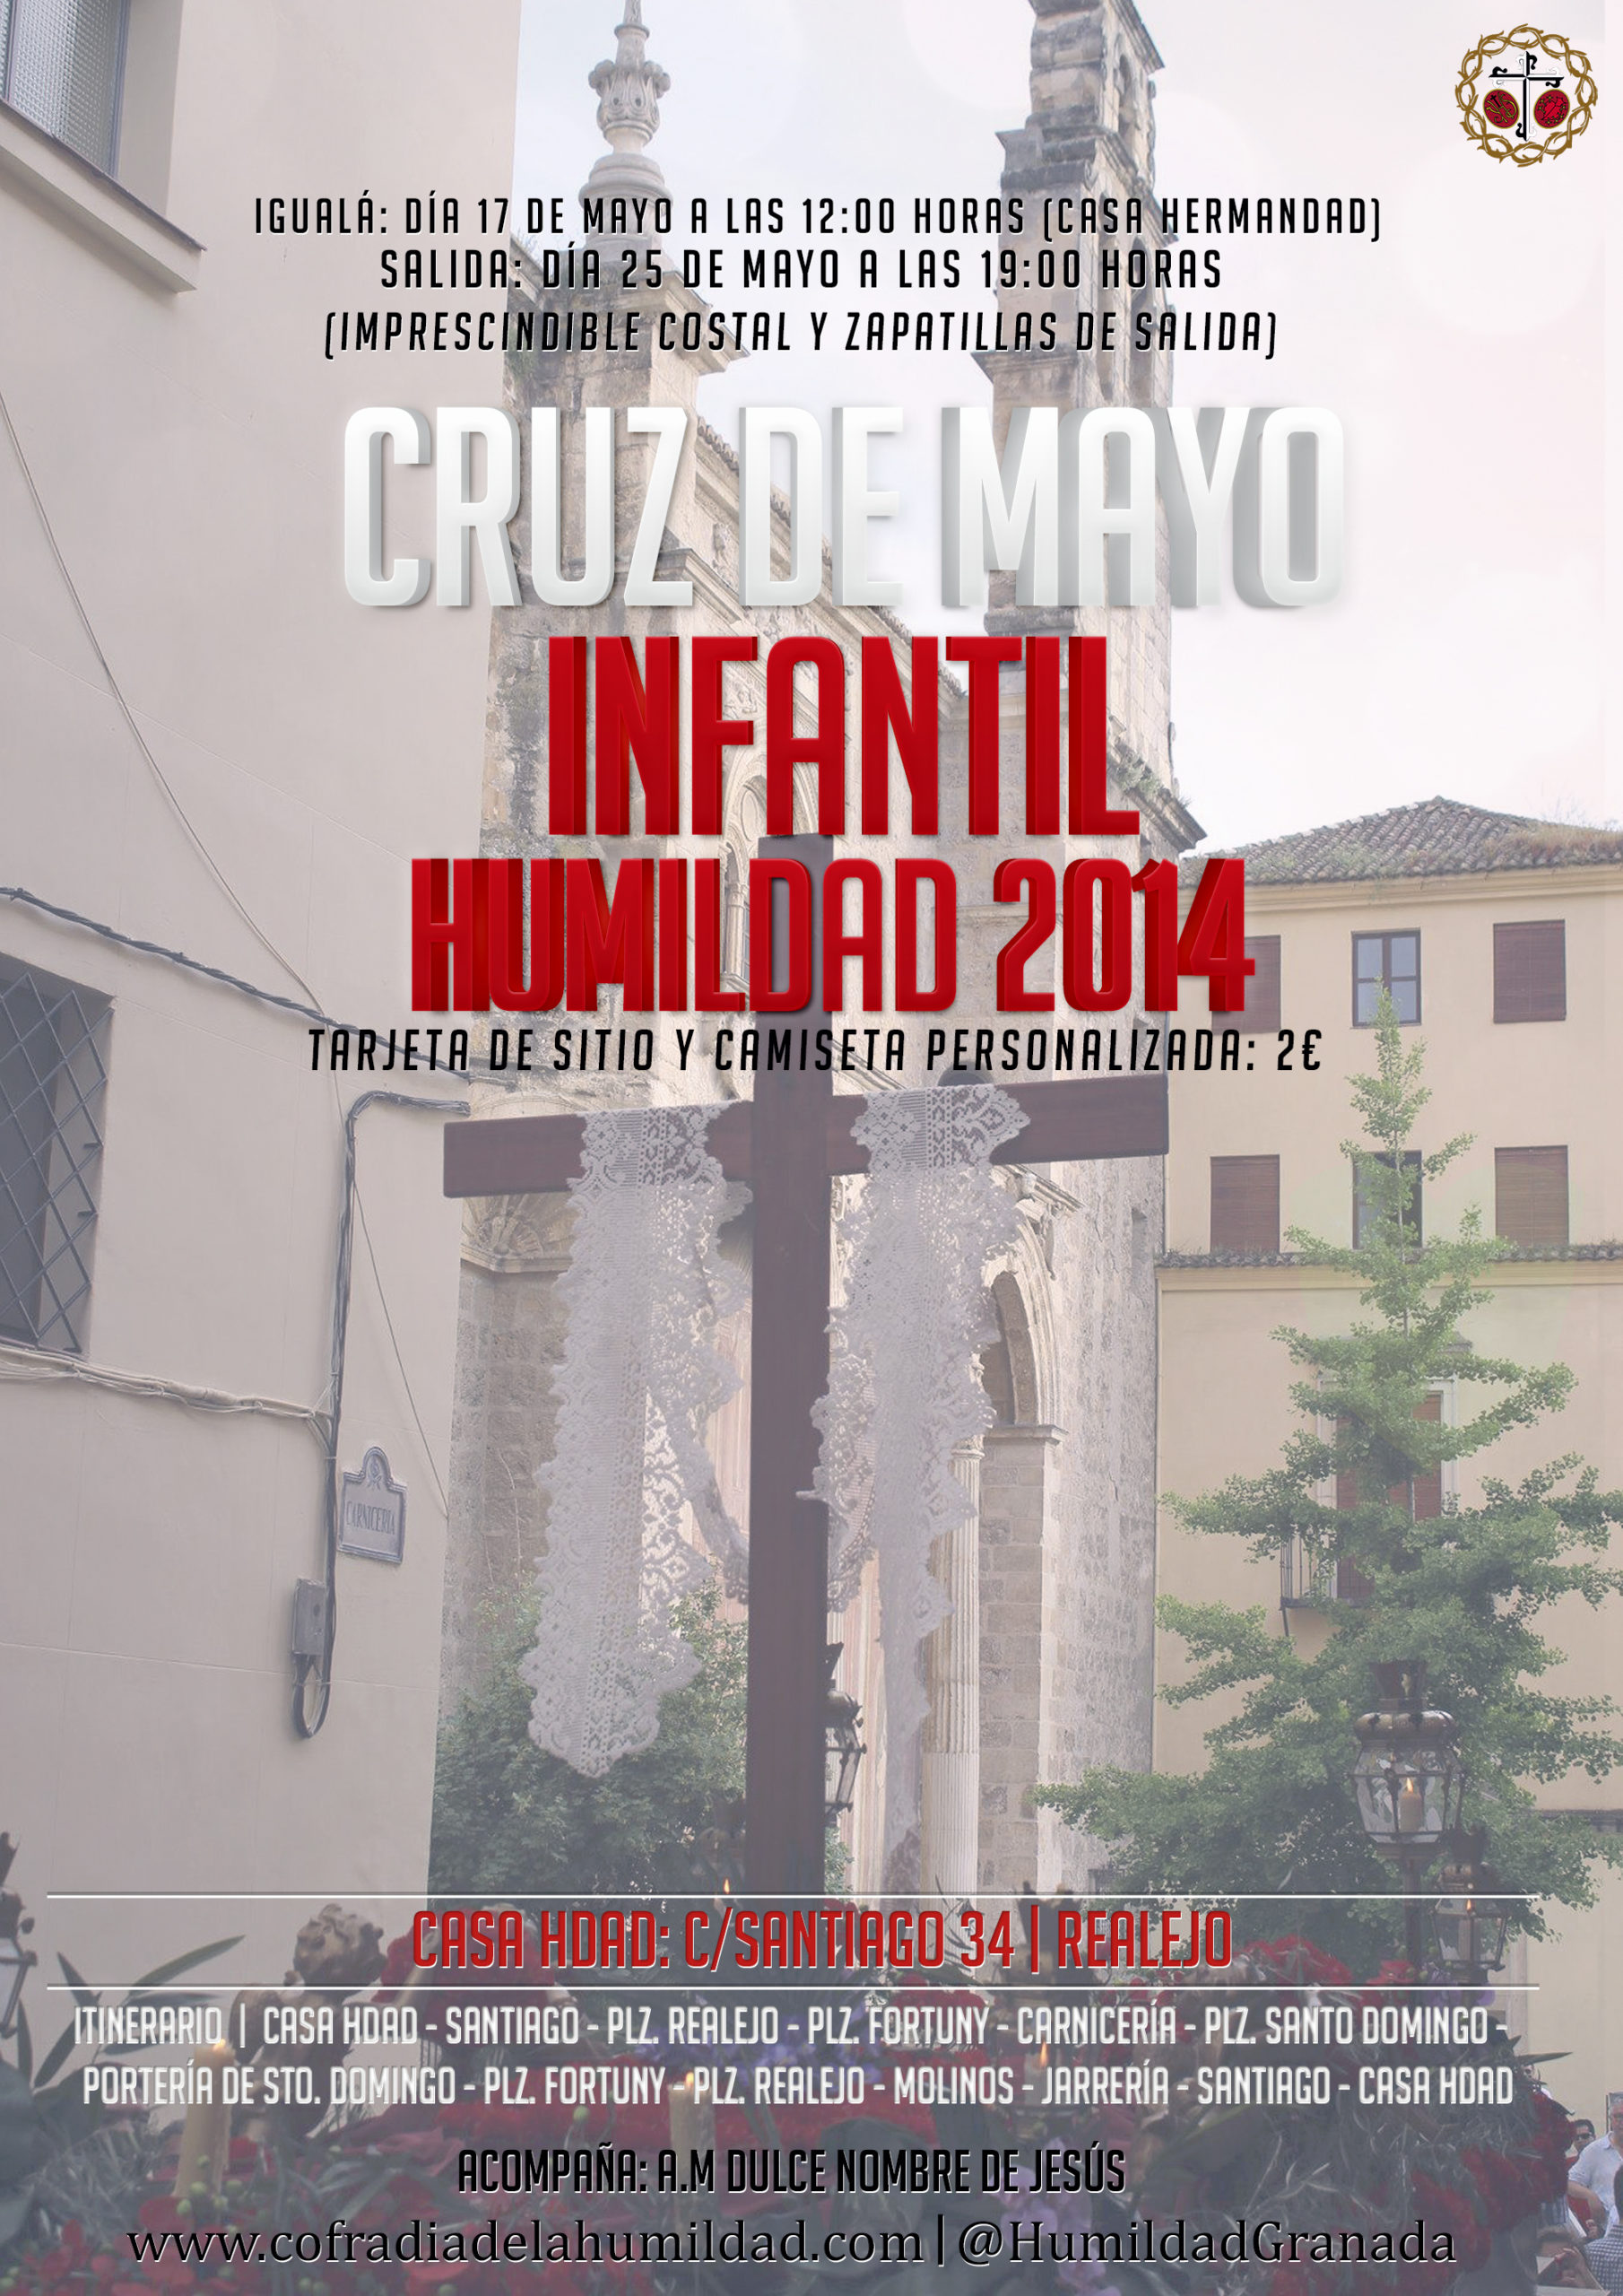 Cruz de Mayo Infantil Humildad 2014